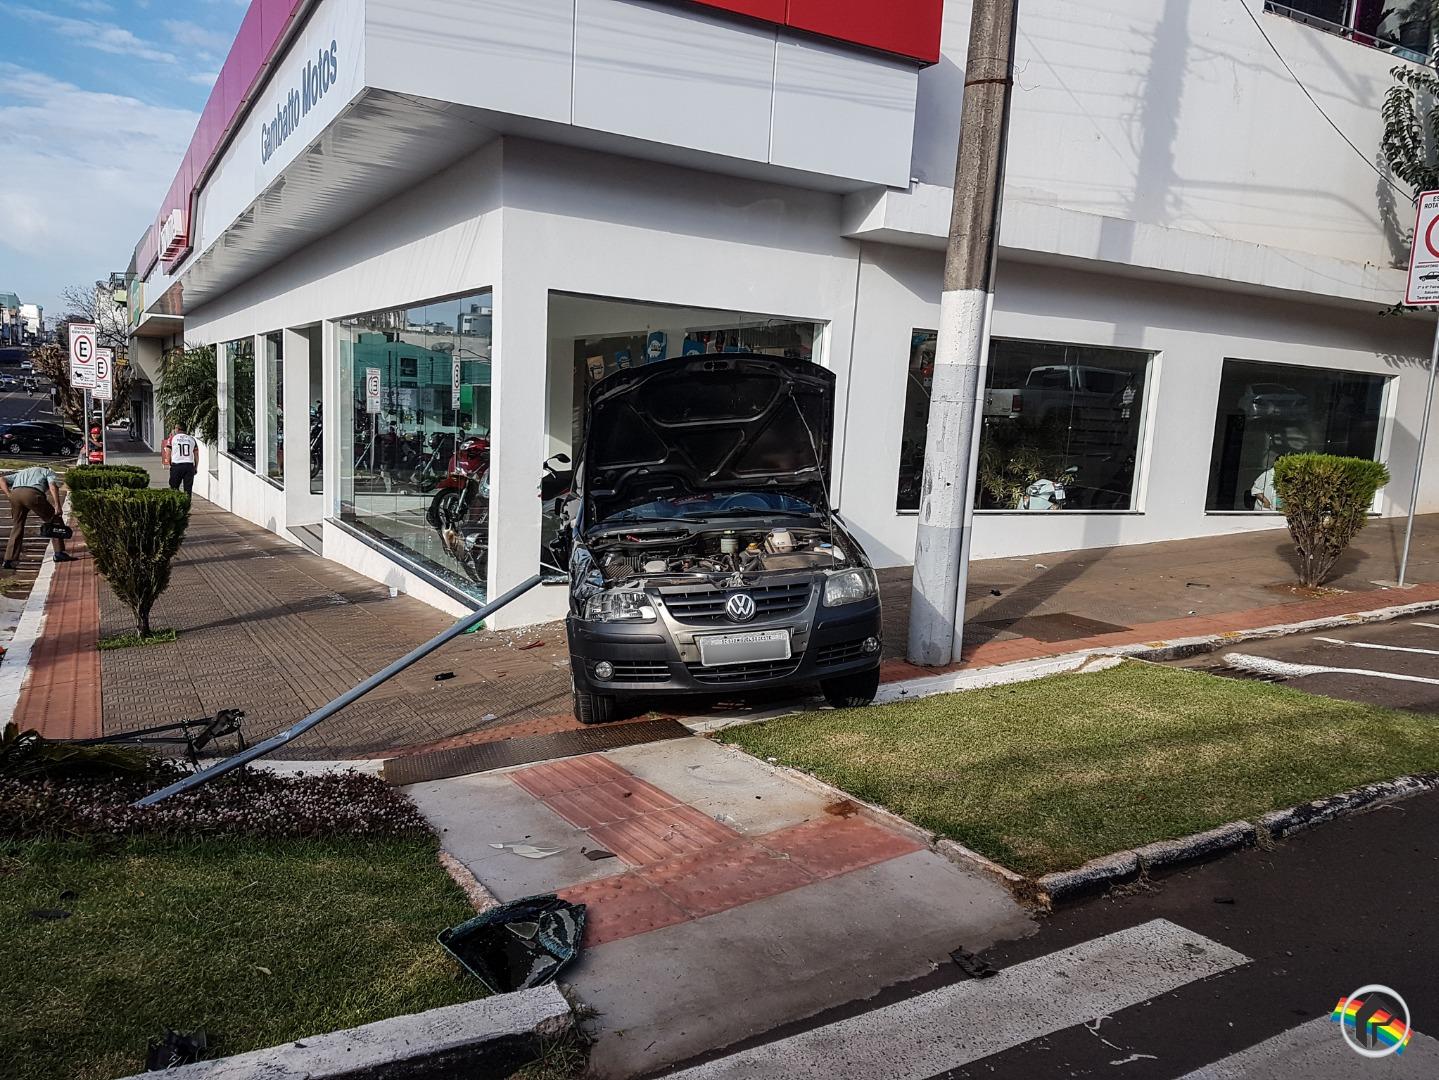 VÍDEO: Veículo tomba no centro após colisão lateral